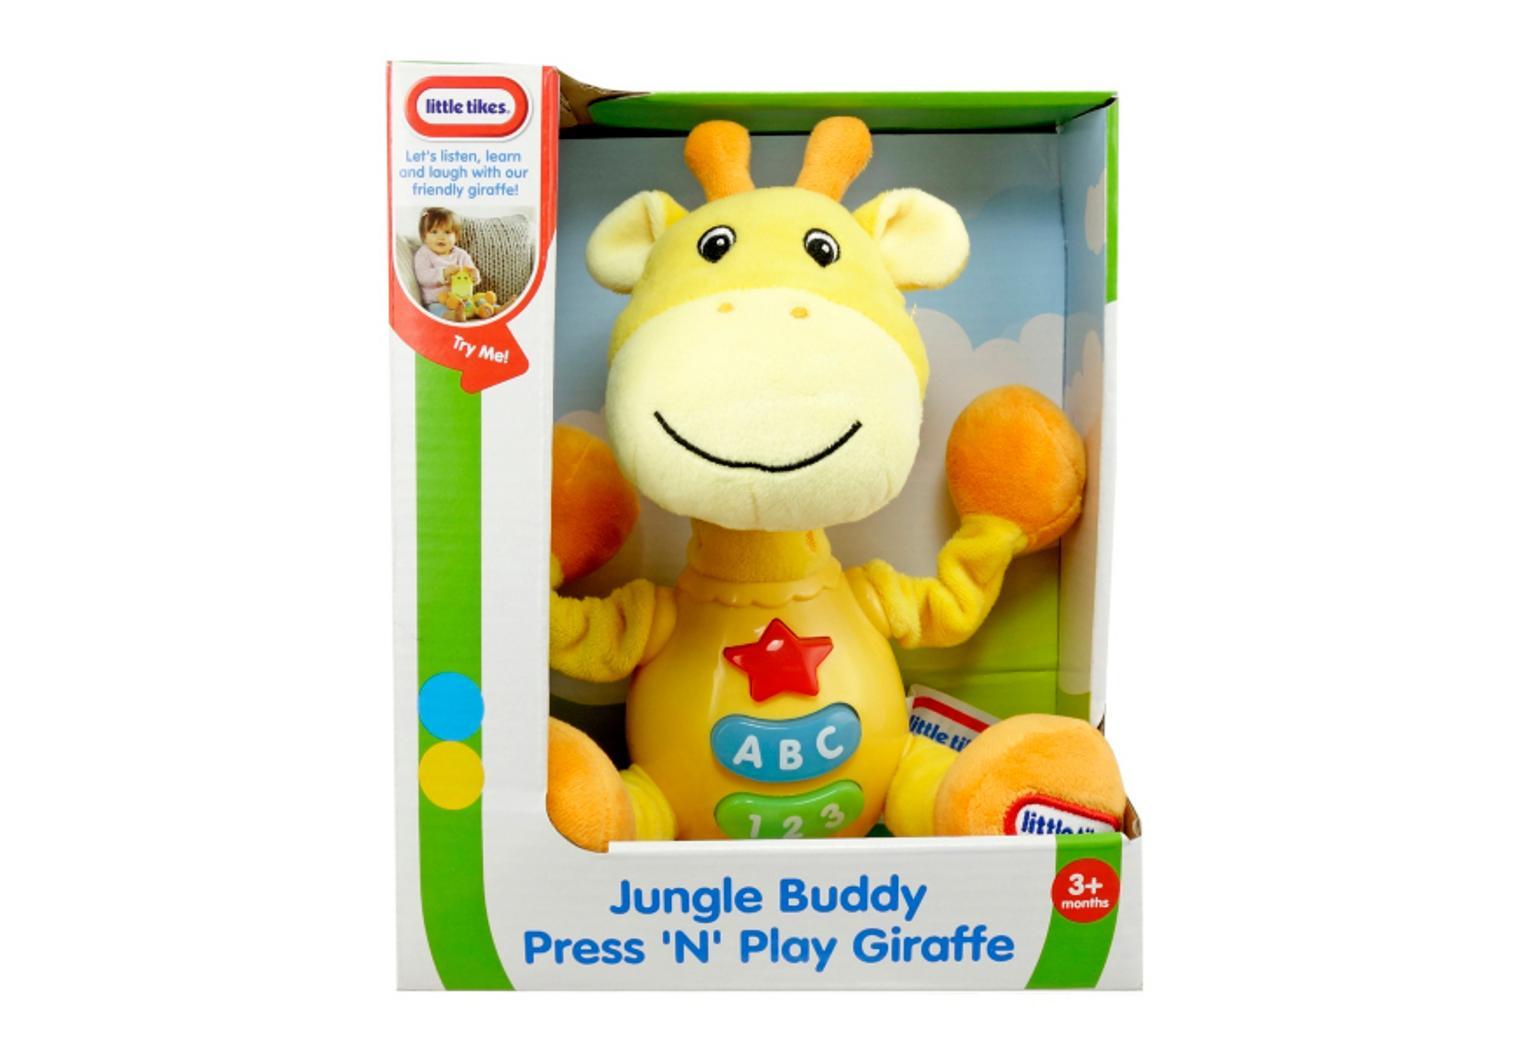 Little Tikes Jungle Buddy Press 'N' Play Giraffe - £2 instore @ Asda, Broughton